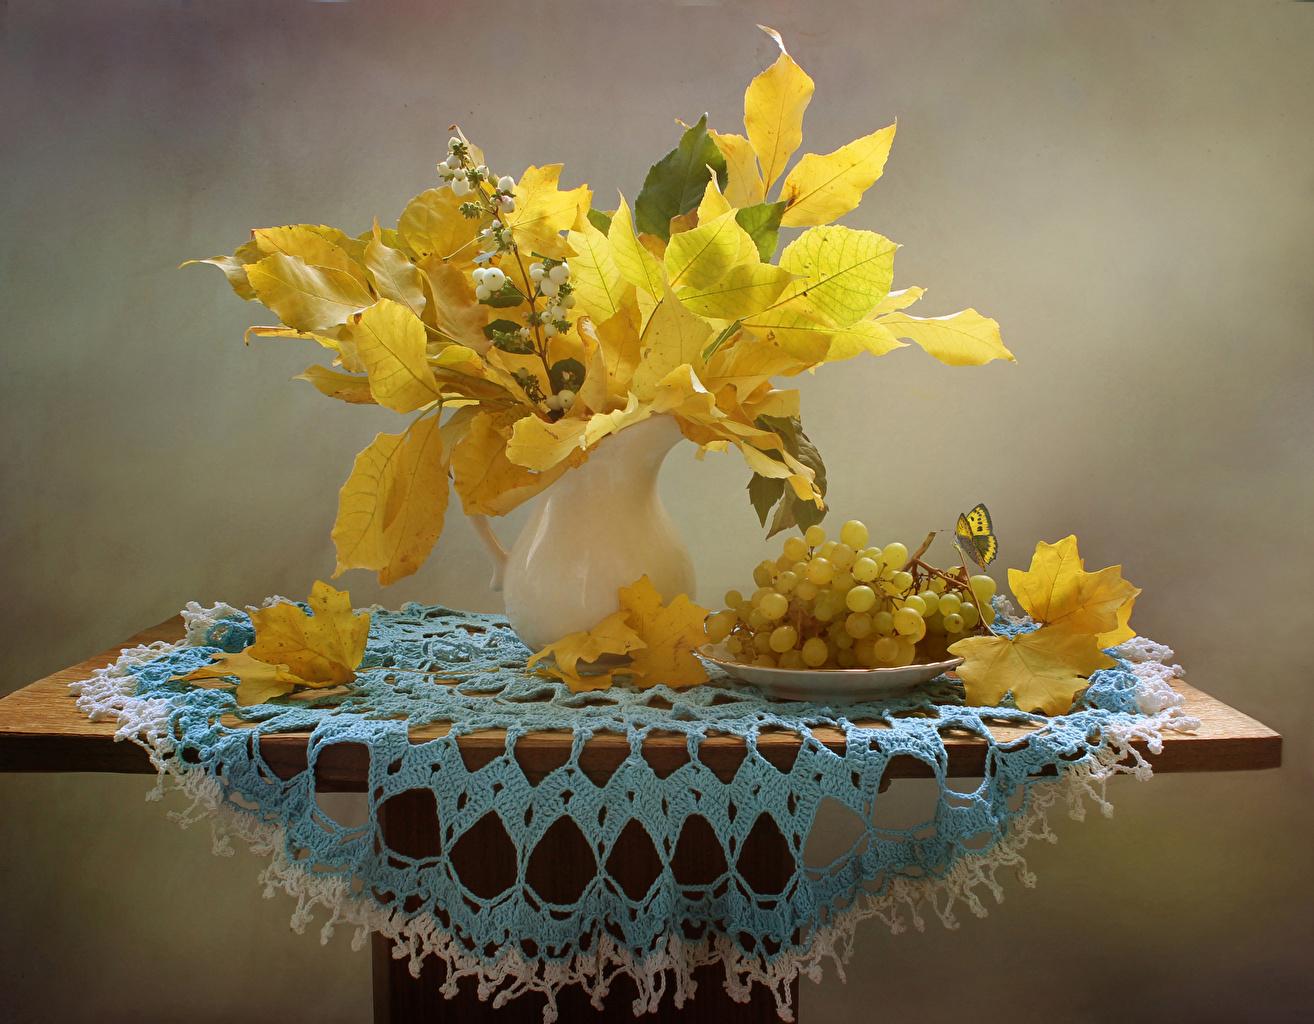 Image Leaf Autumn Grapes Vase Food Table Foliage